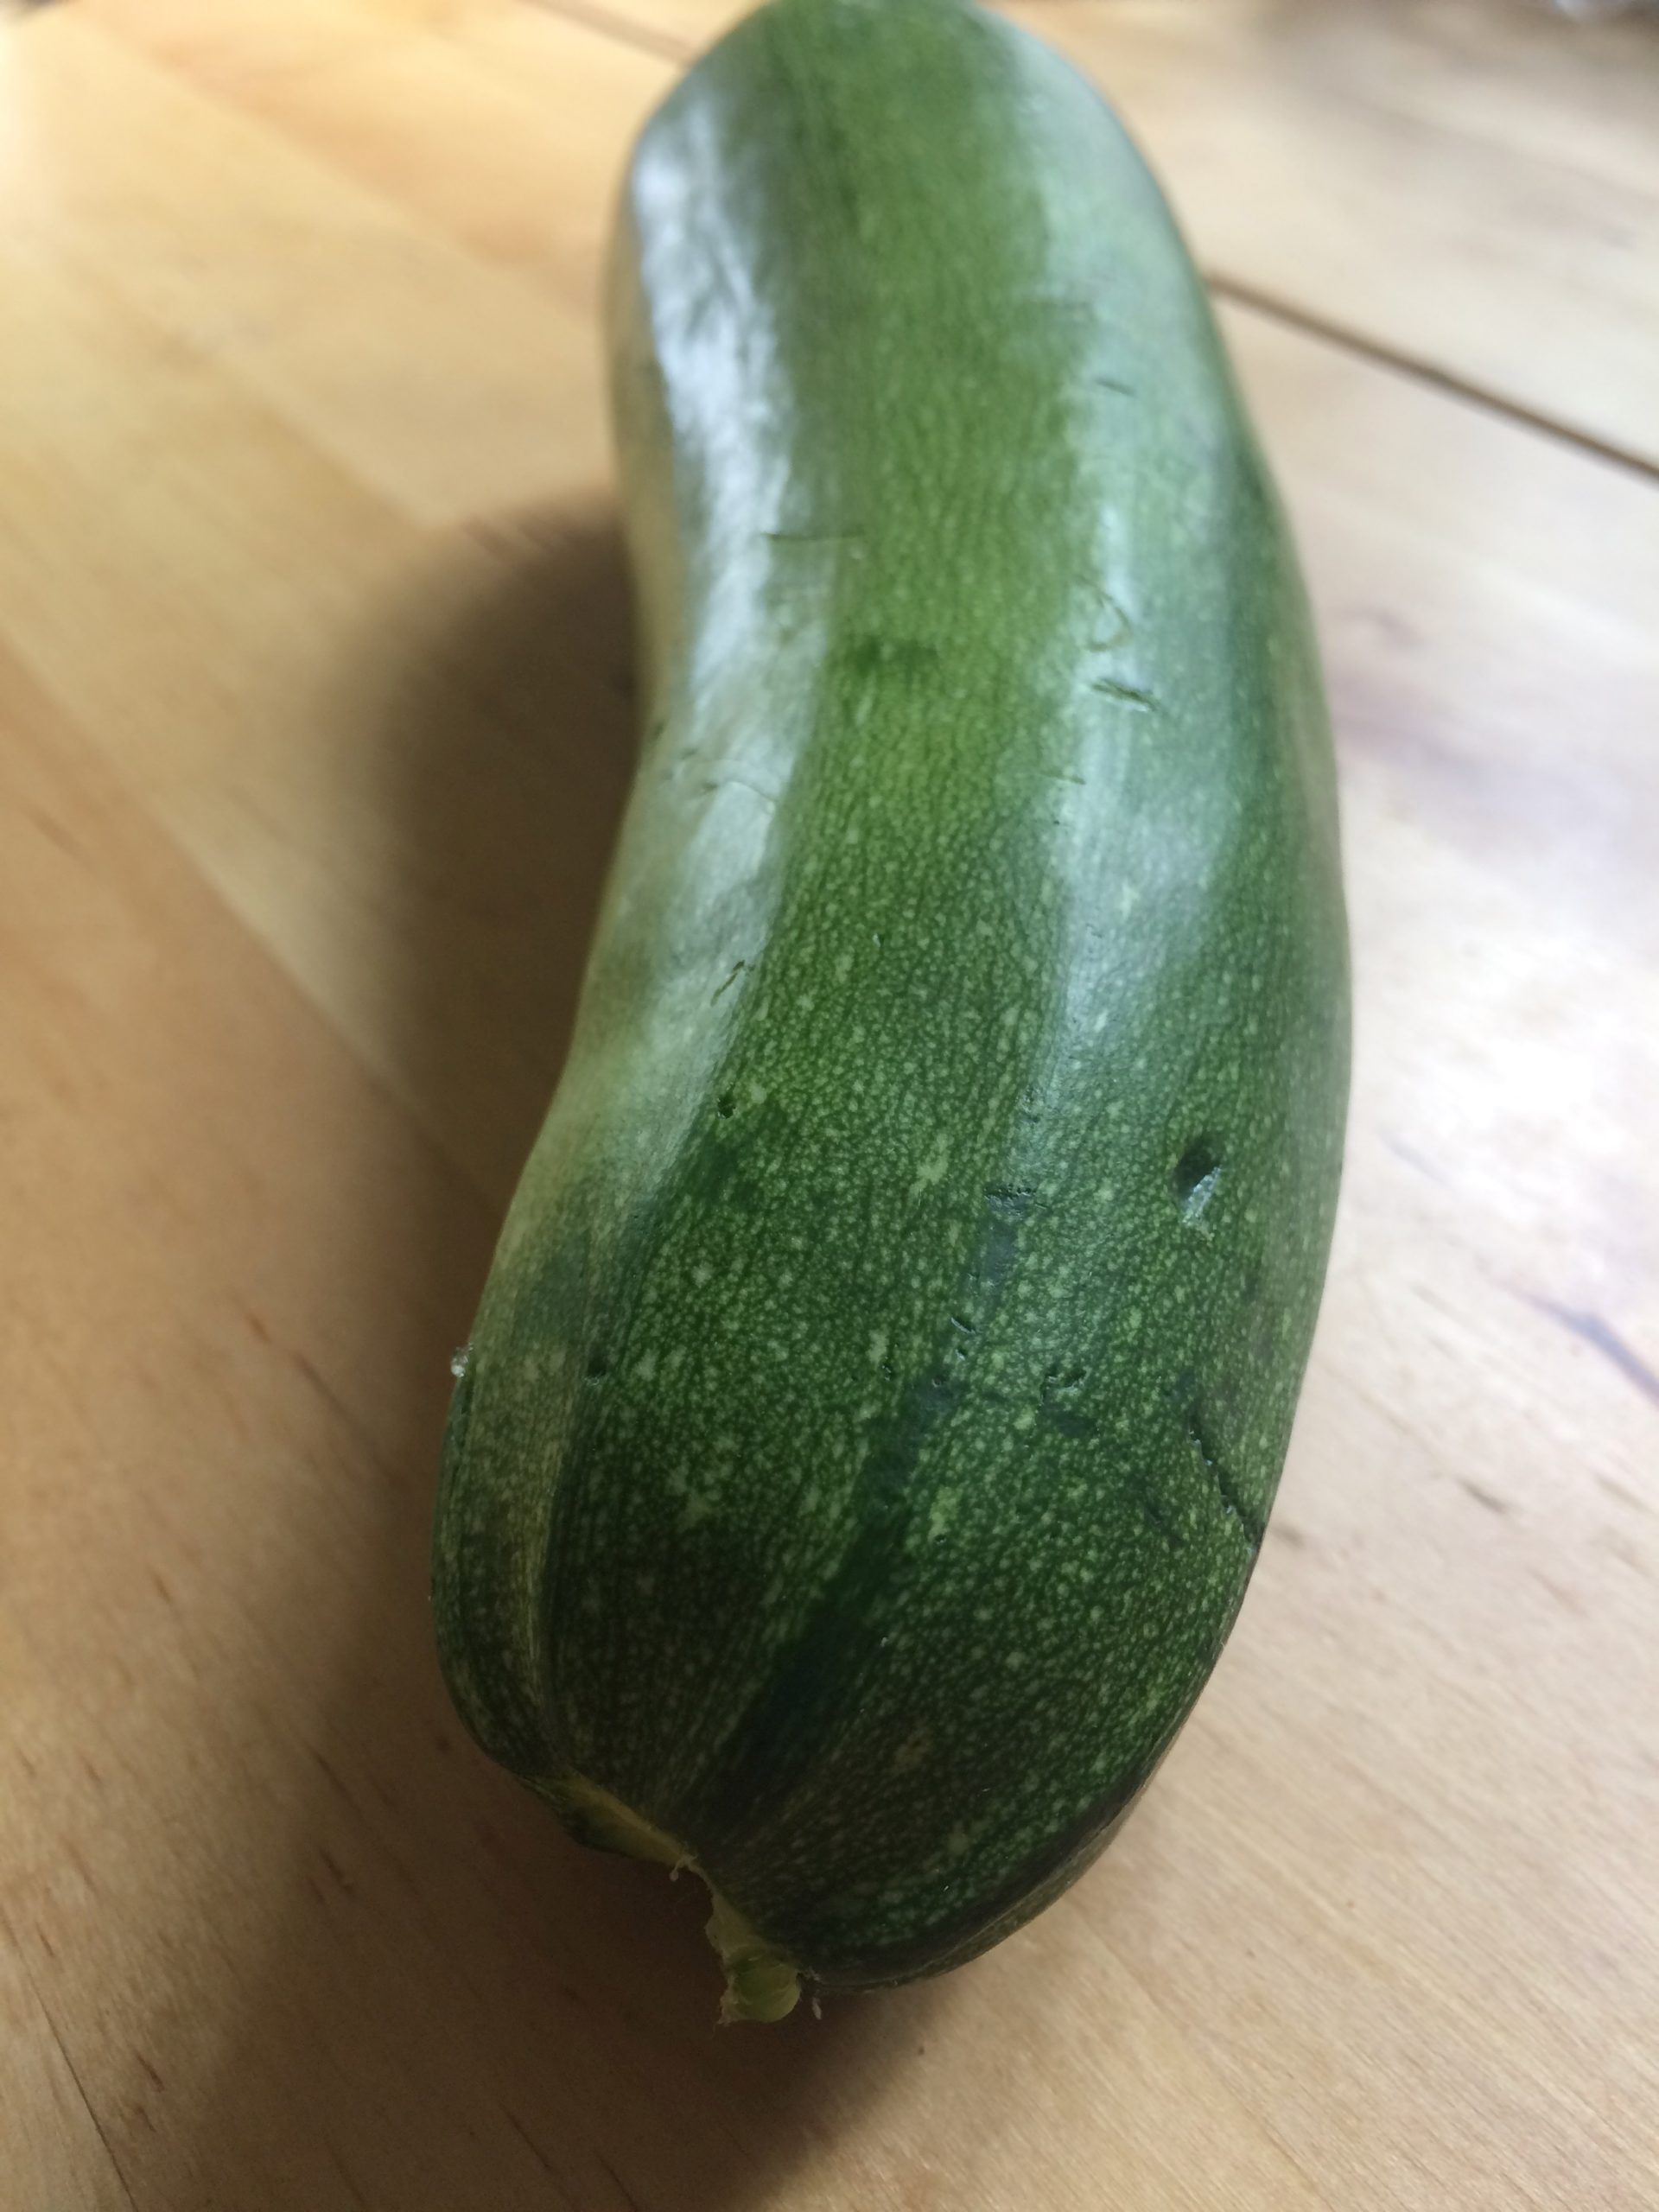 Vegetable Starts